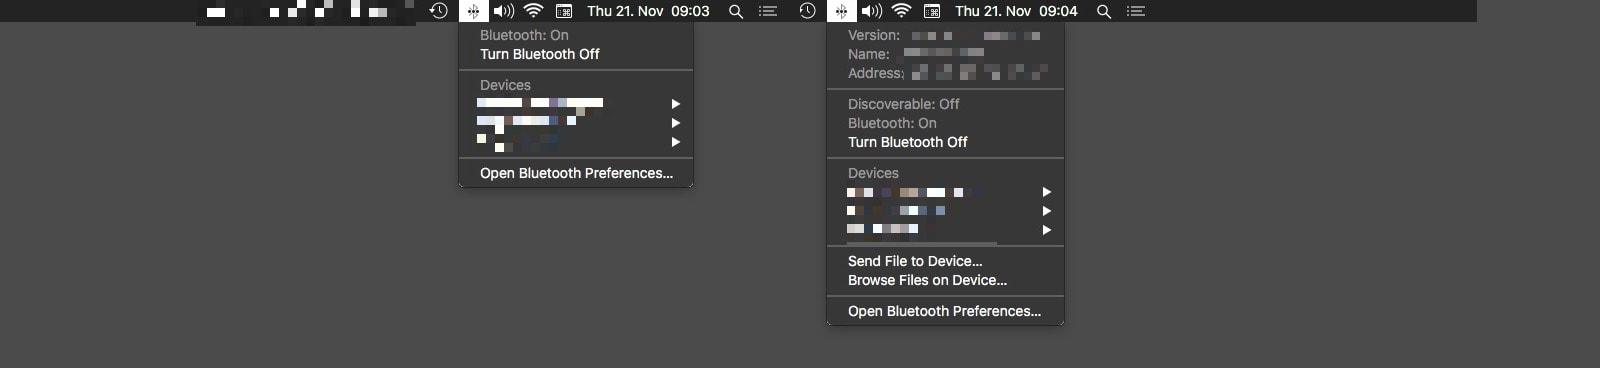 The hidden Bluetooth Mac status menu options.